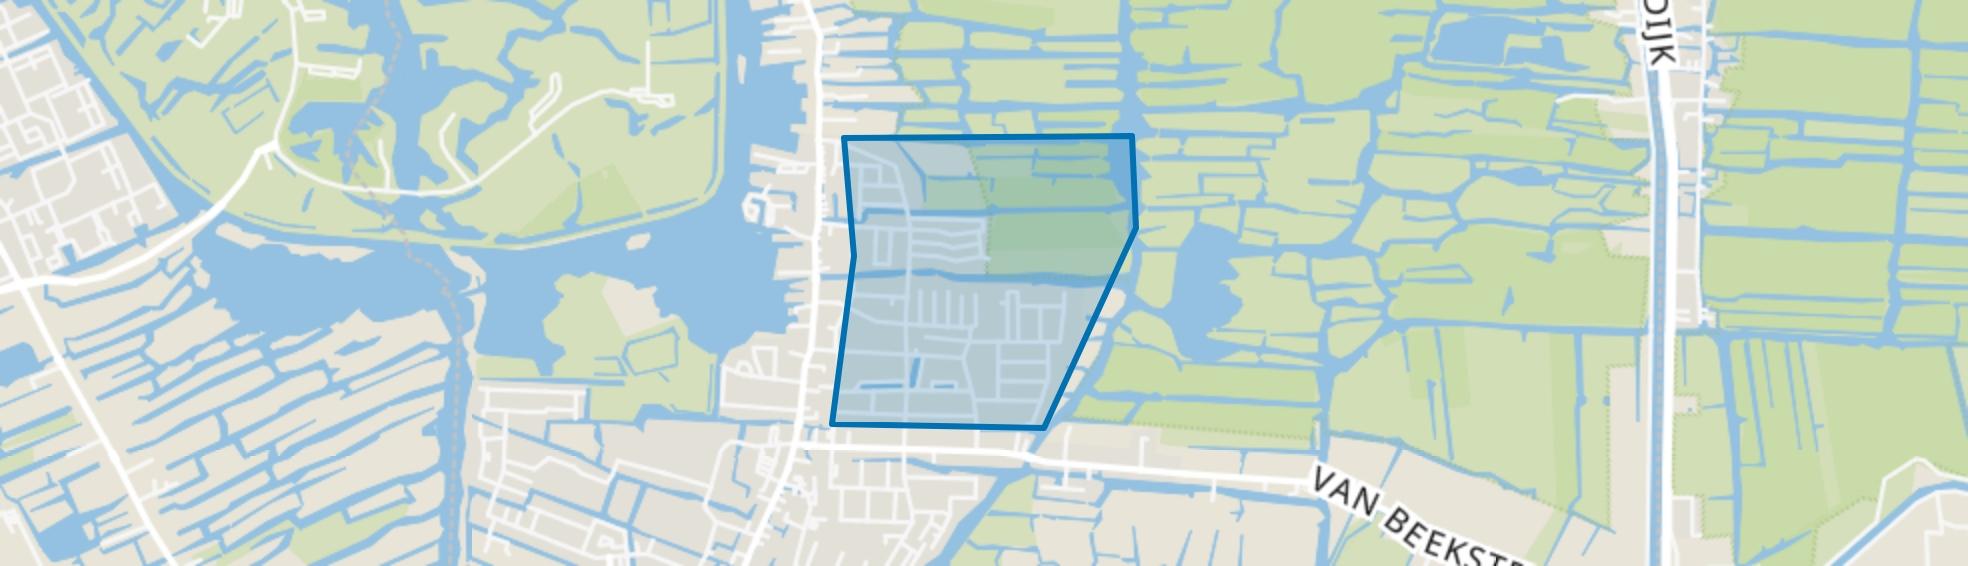 Plan Centrum-Noord, Landsmeer map